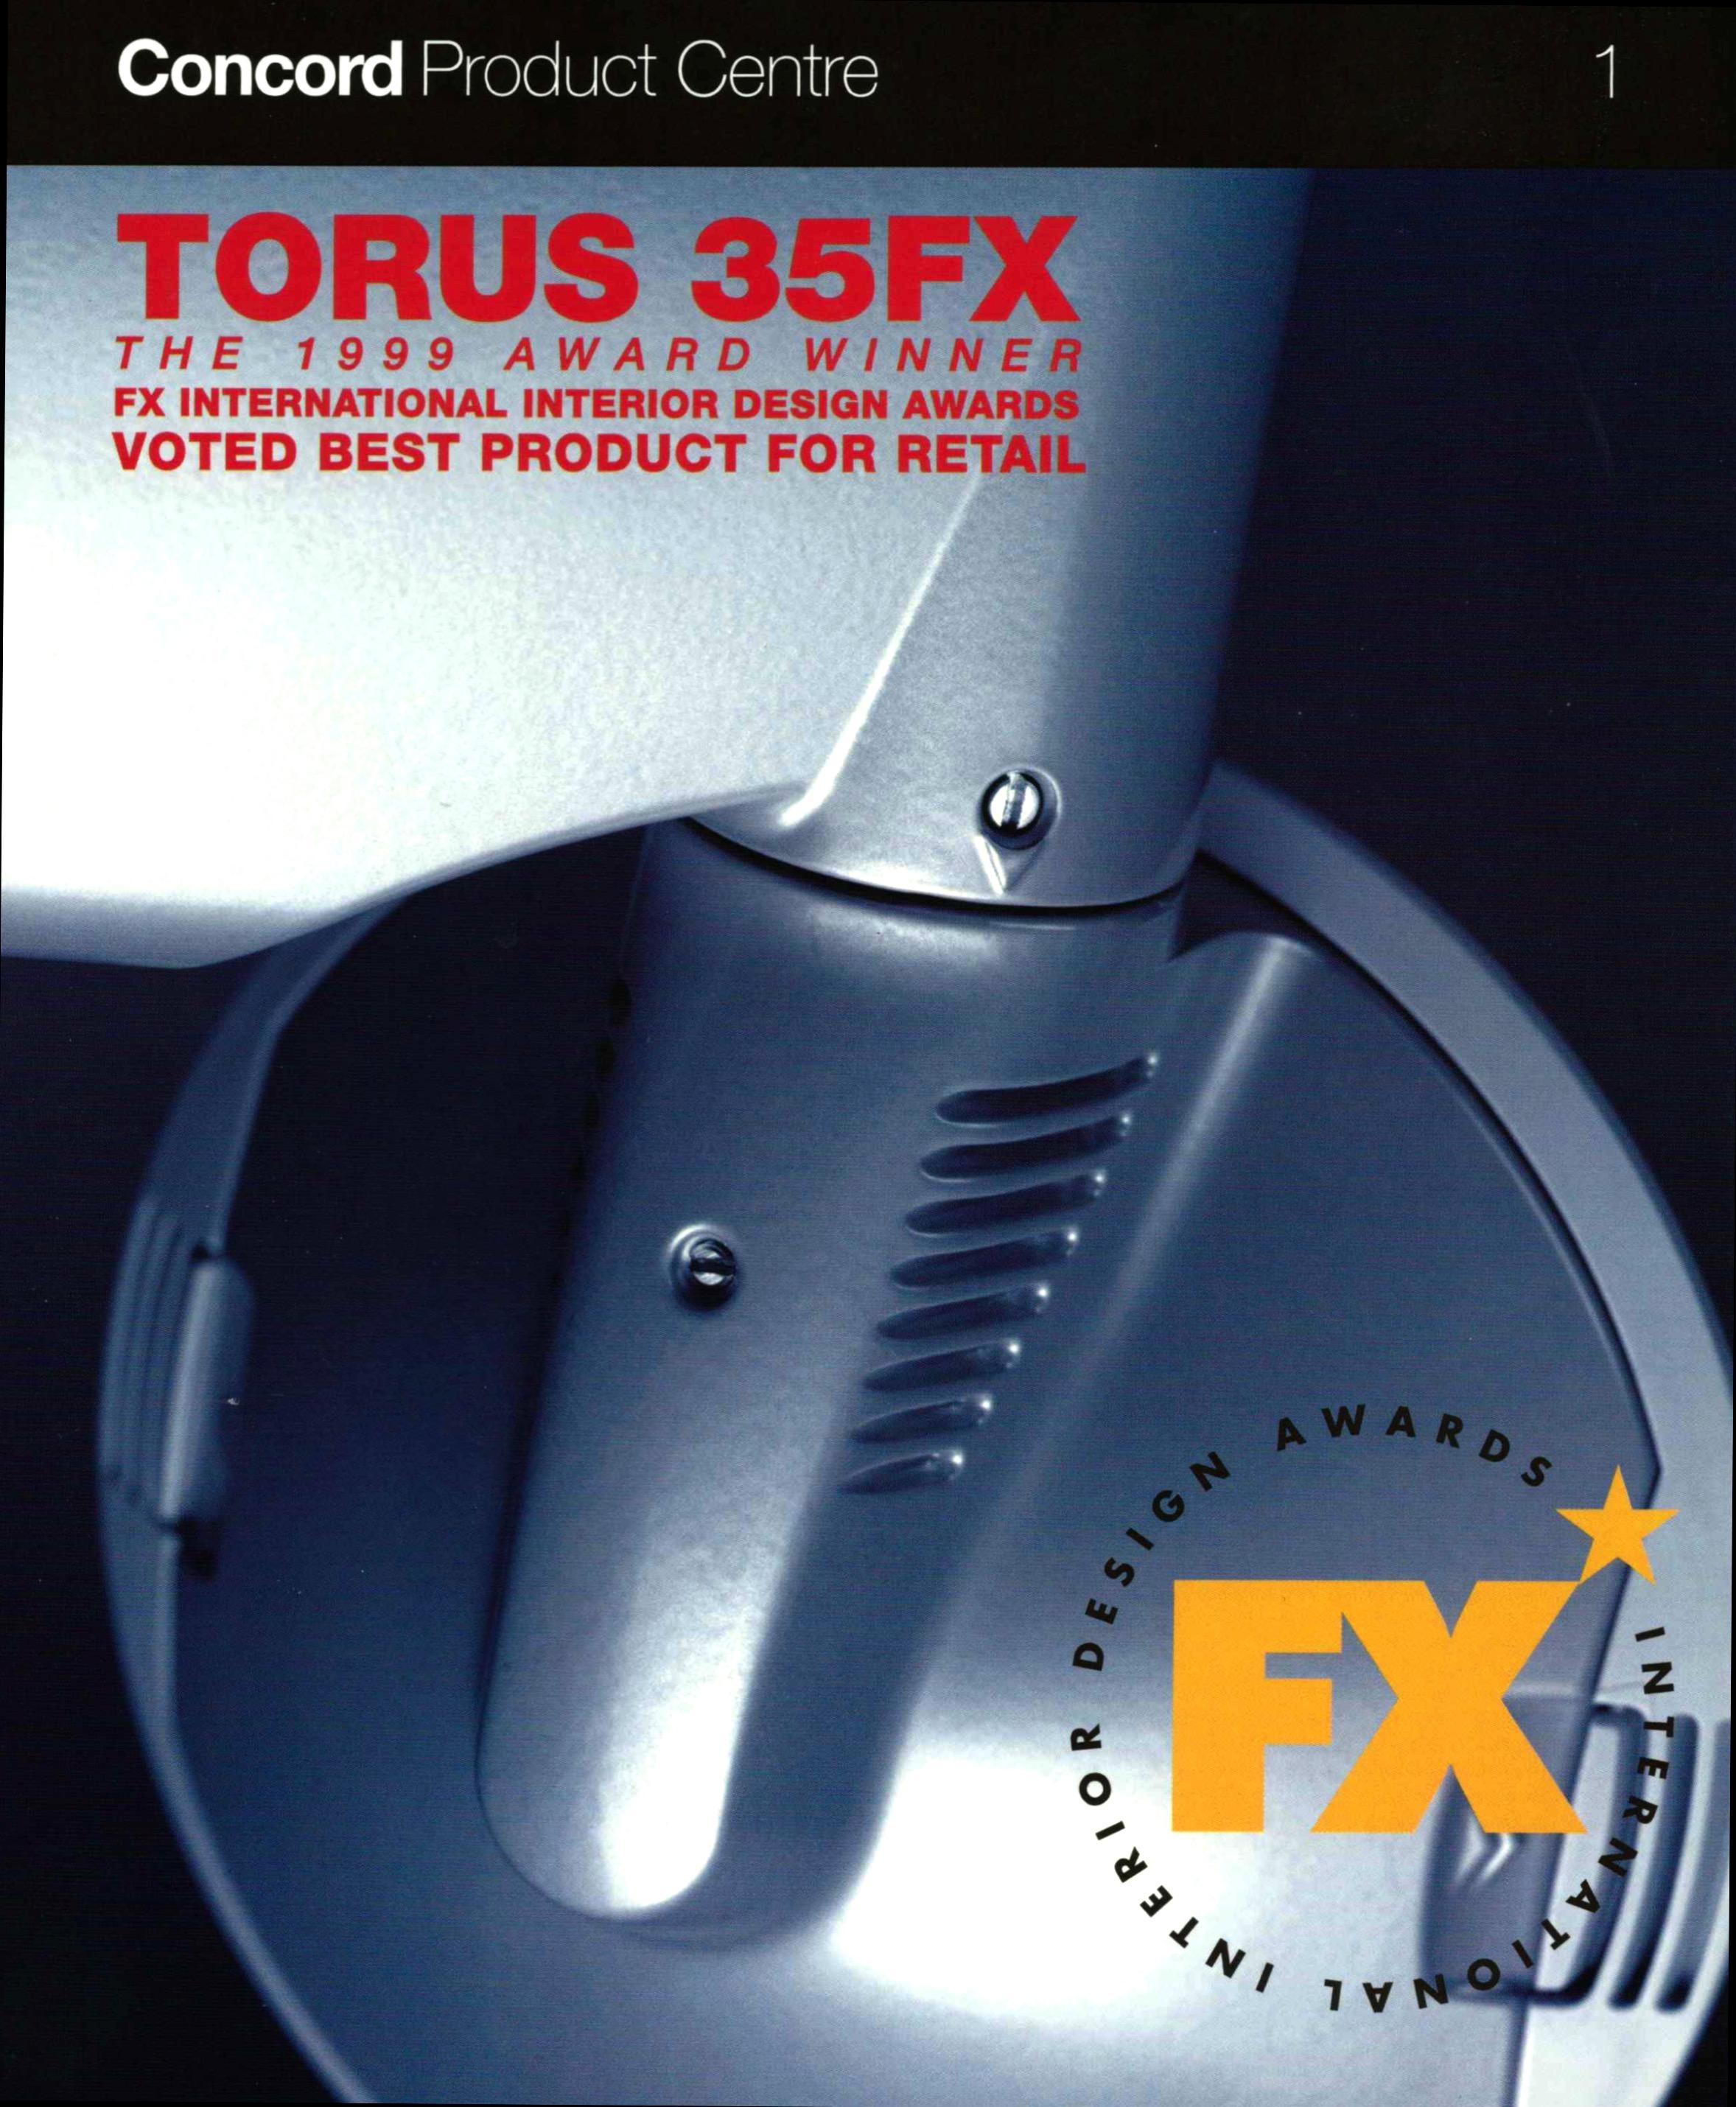 Concord Torus 35FX - Promotional Material